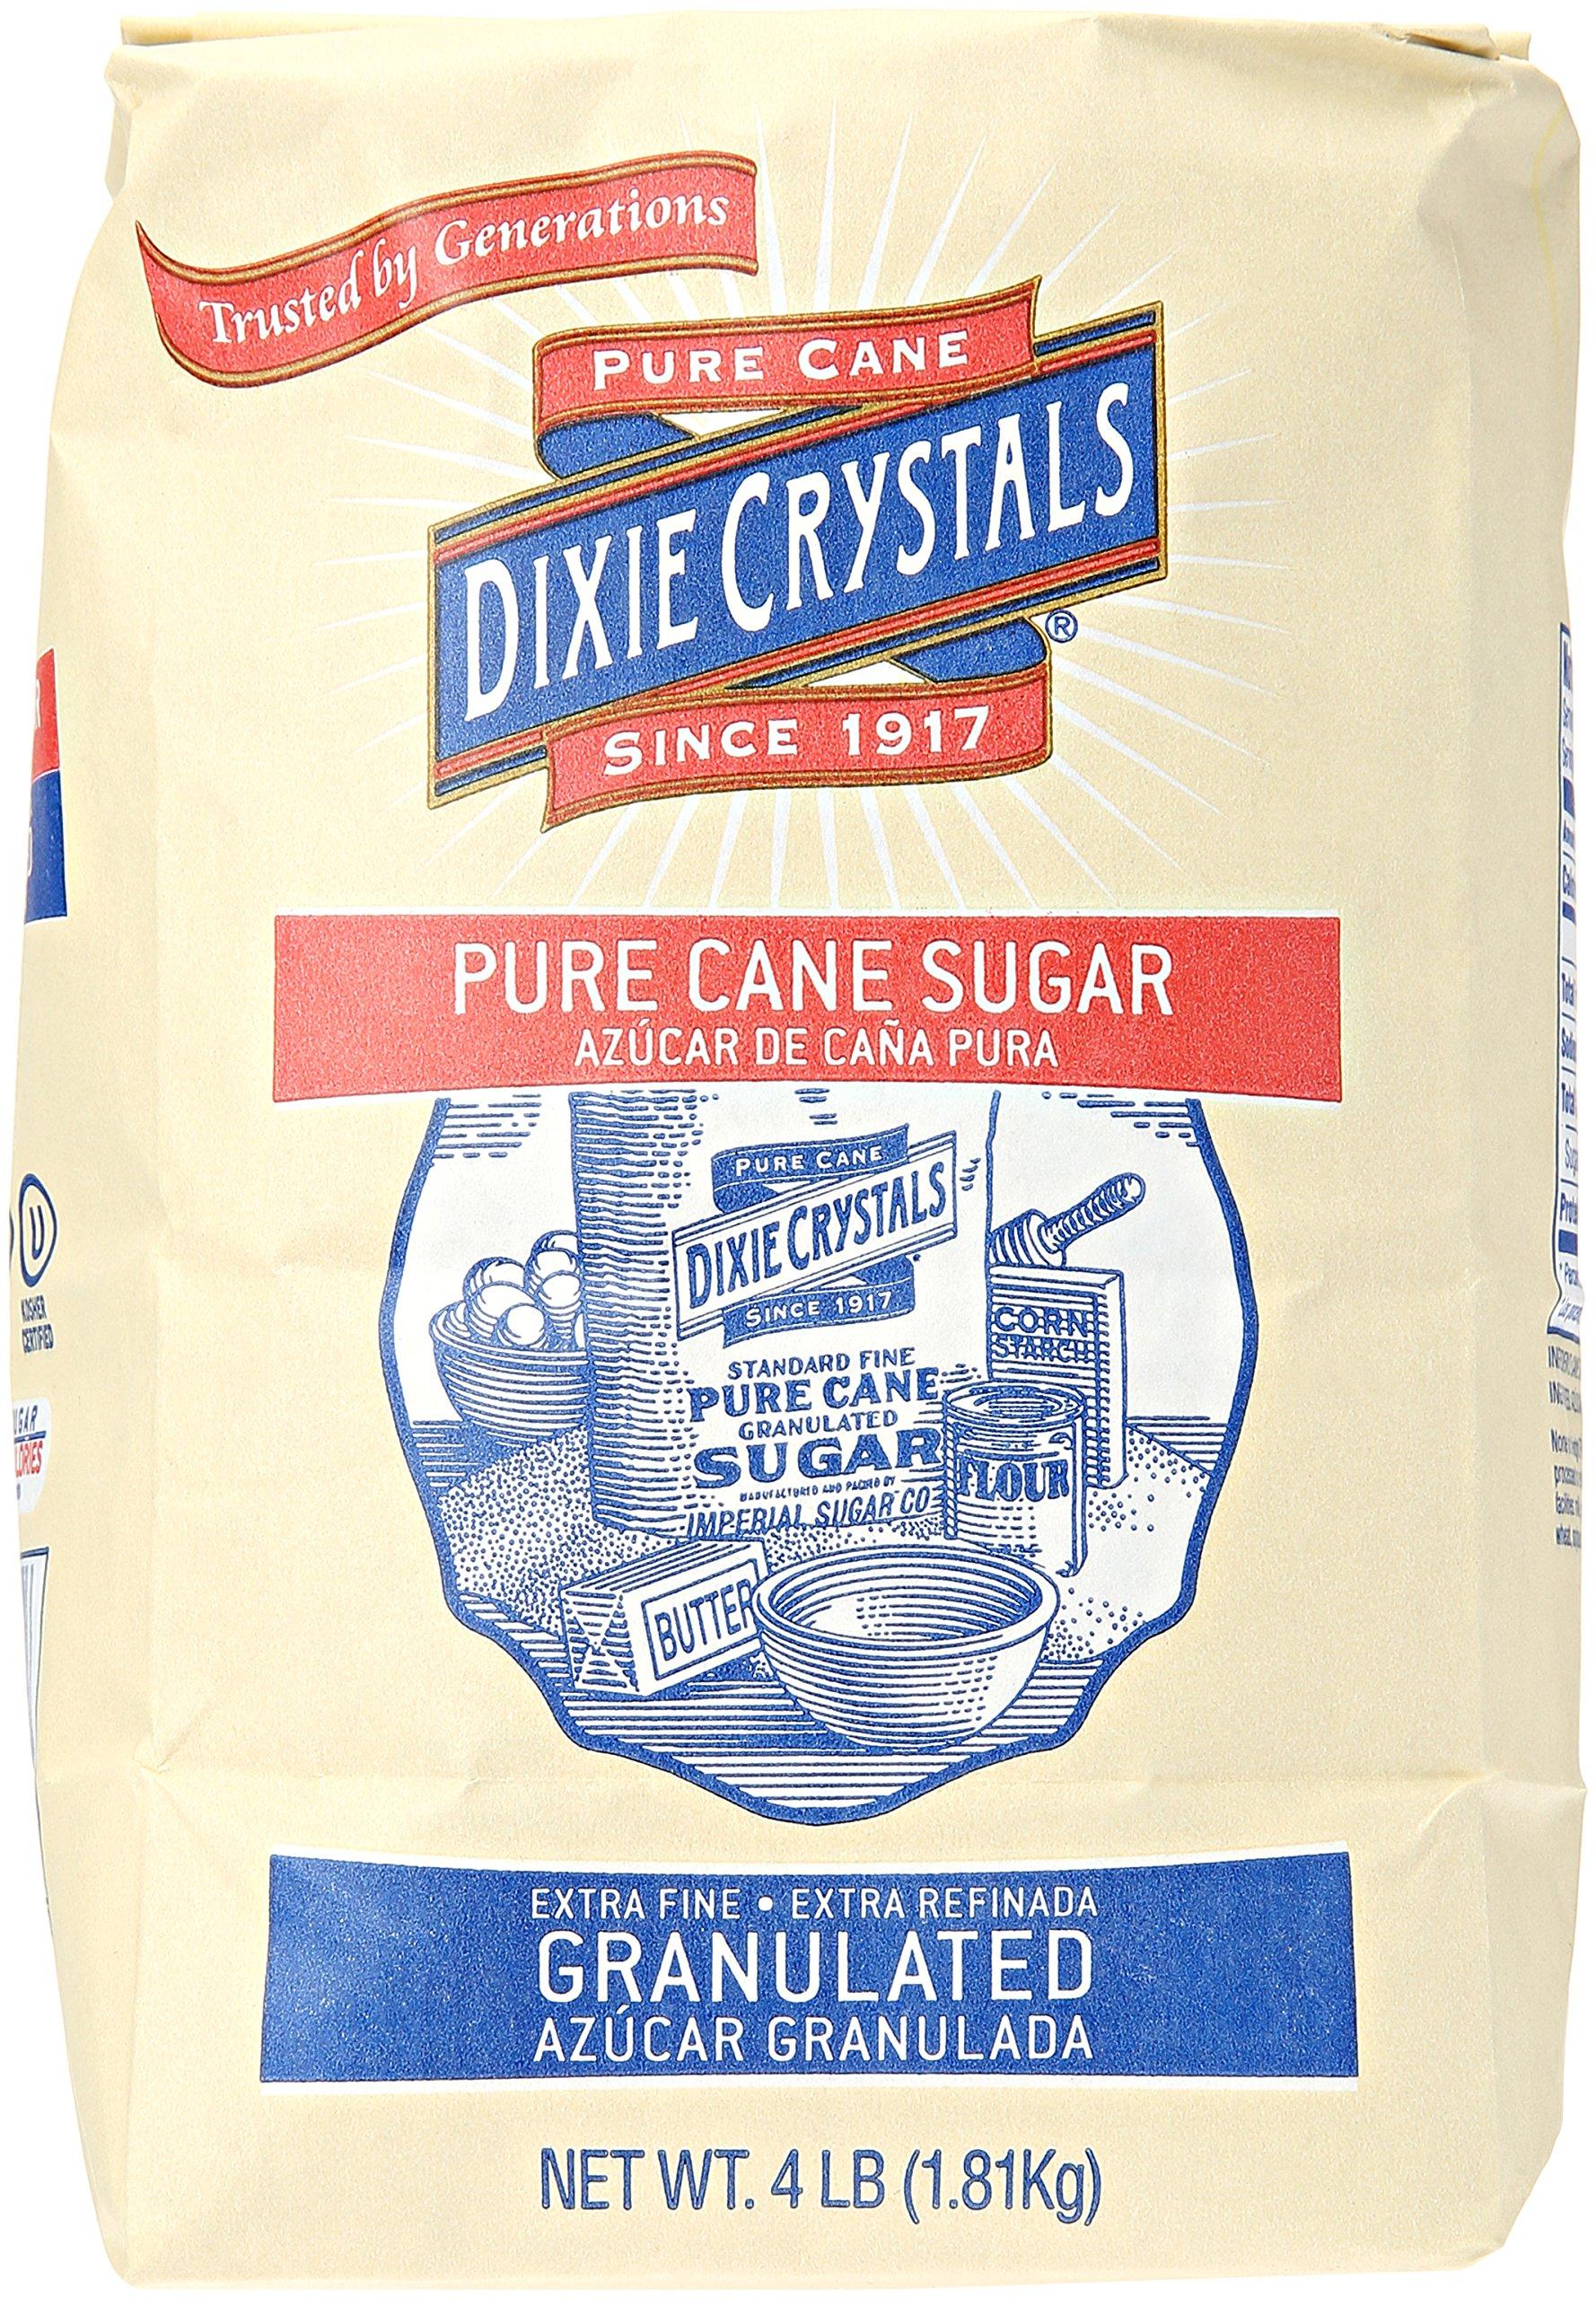 Imperial Sugar Dixie Crystals Pure Cane Sugar, 4 lb